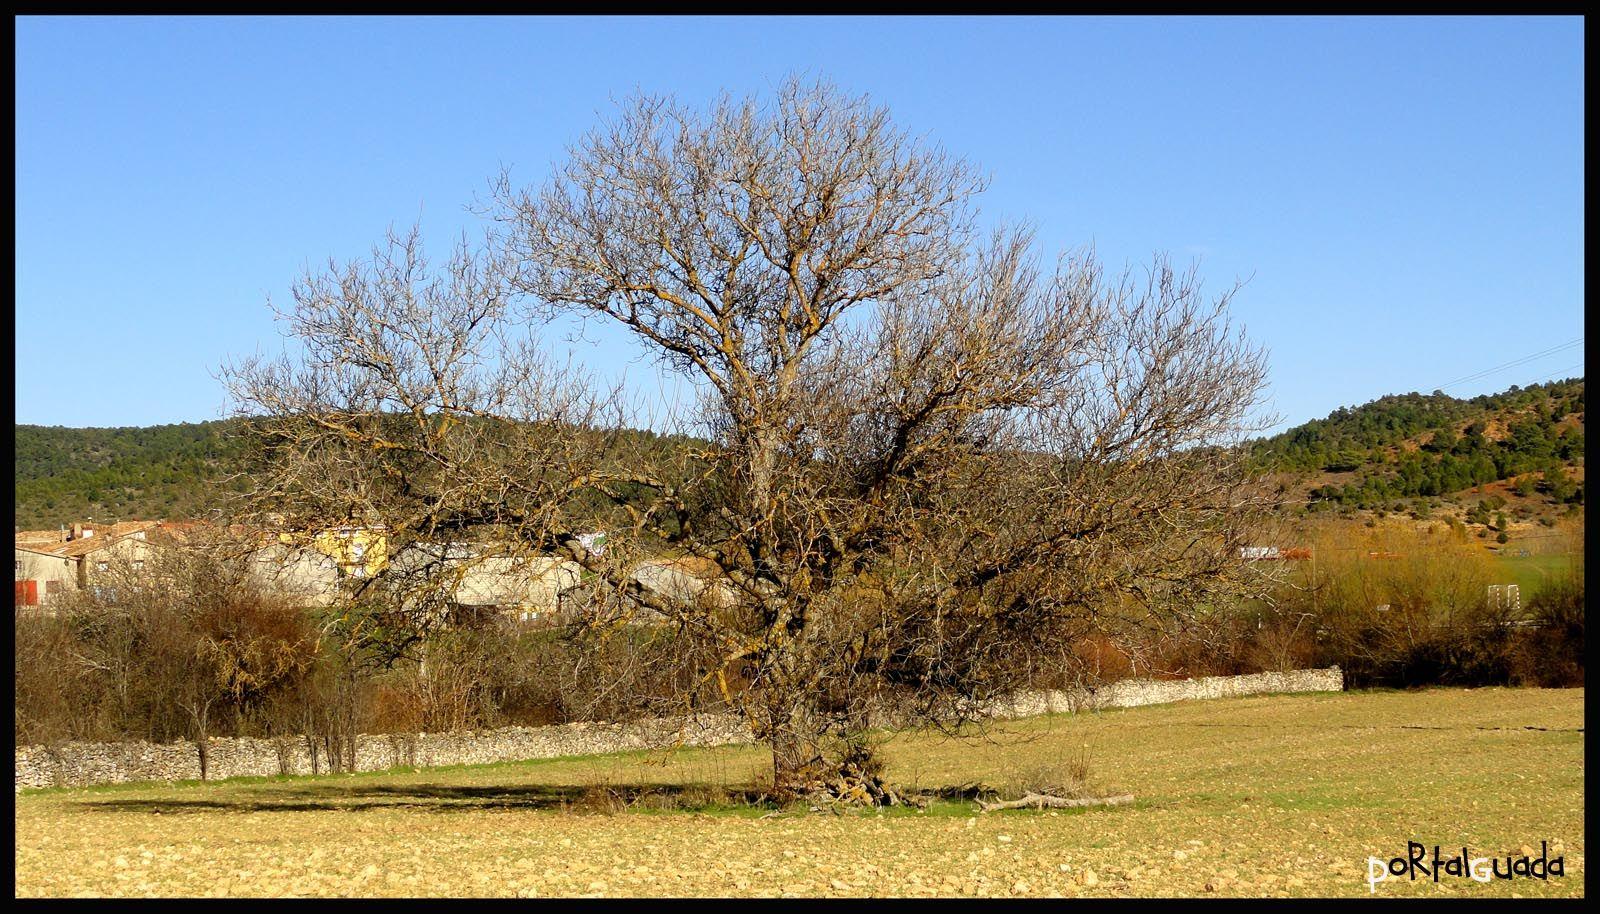 Rincones de Arbeteta, Guadalajara - España  www.portalguada.com  PortalGuada